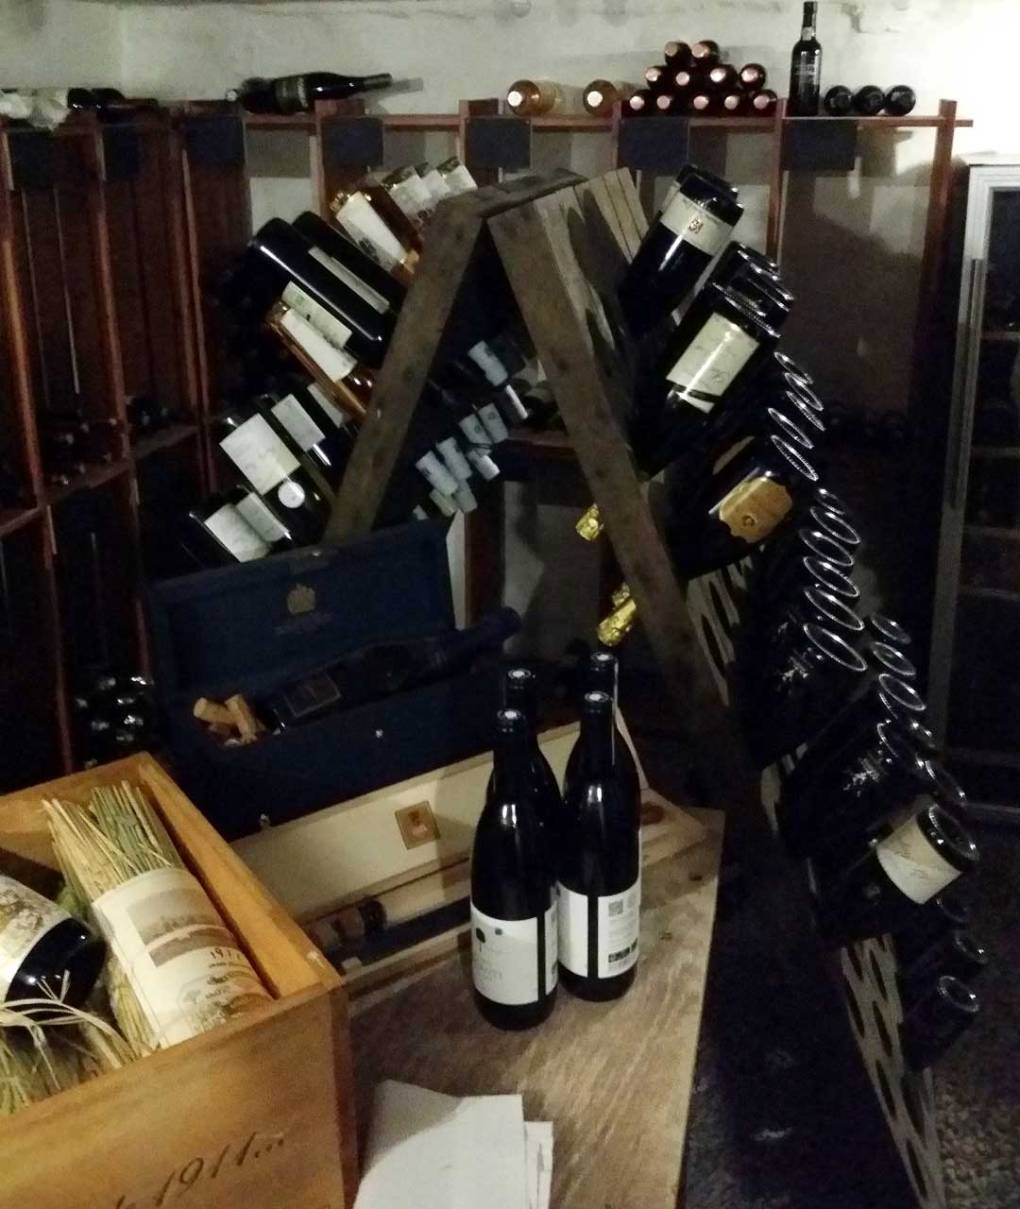 sdr-bjert-kro-wine-cellar